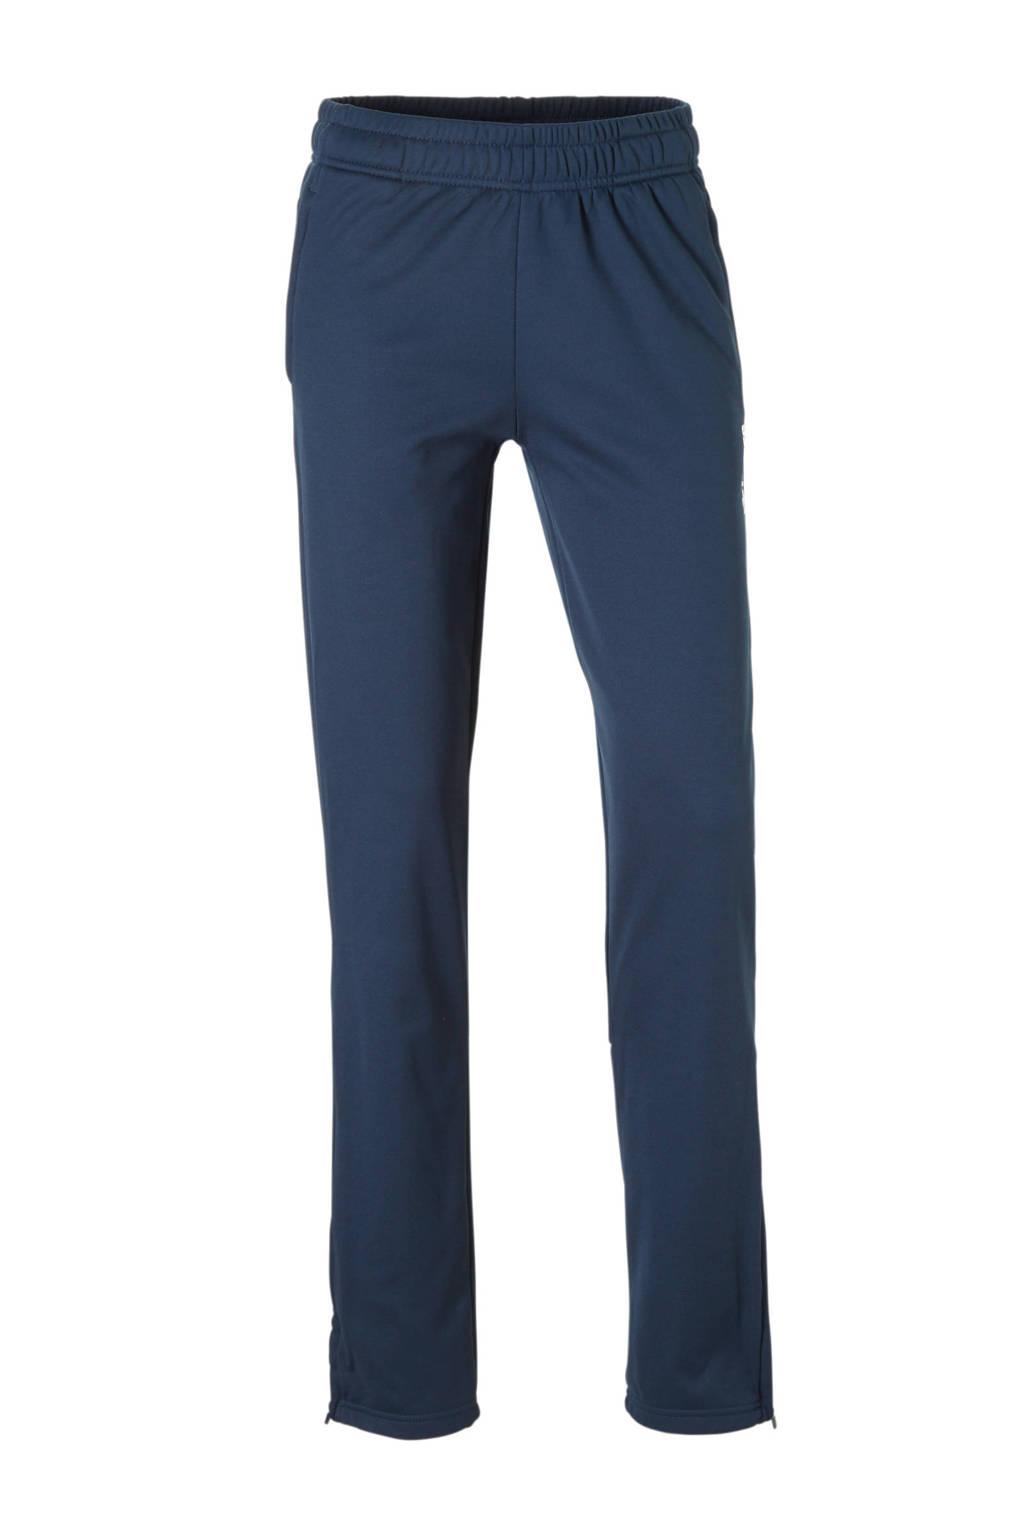 Reece Australia hockeybroek blauw, Blauw/wit